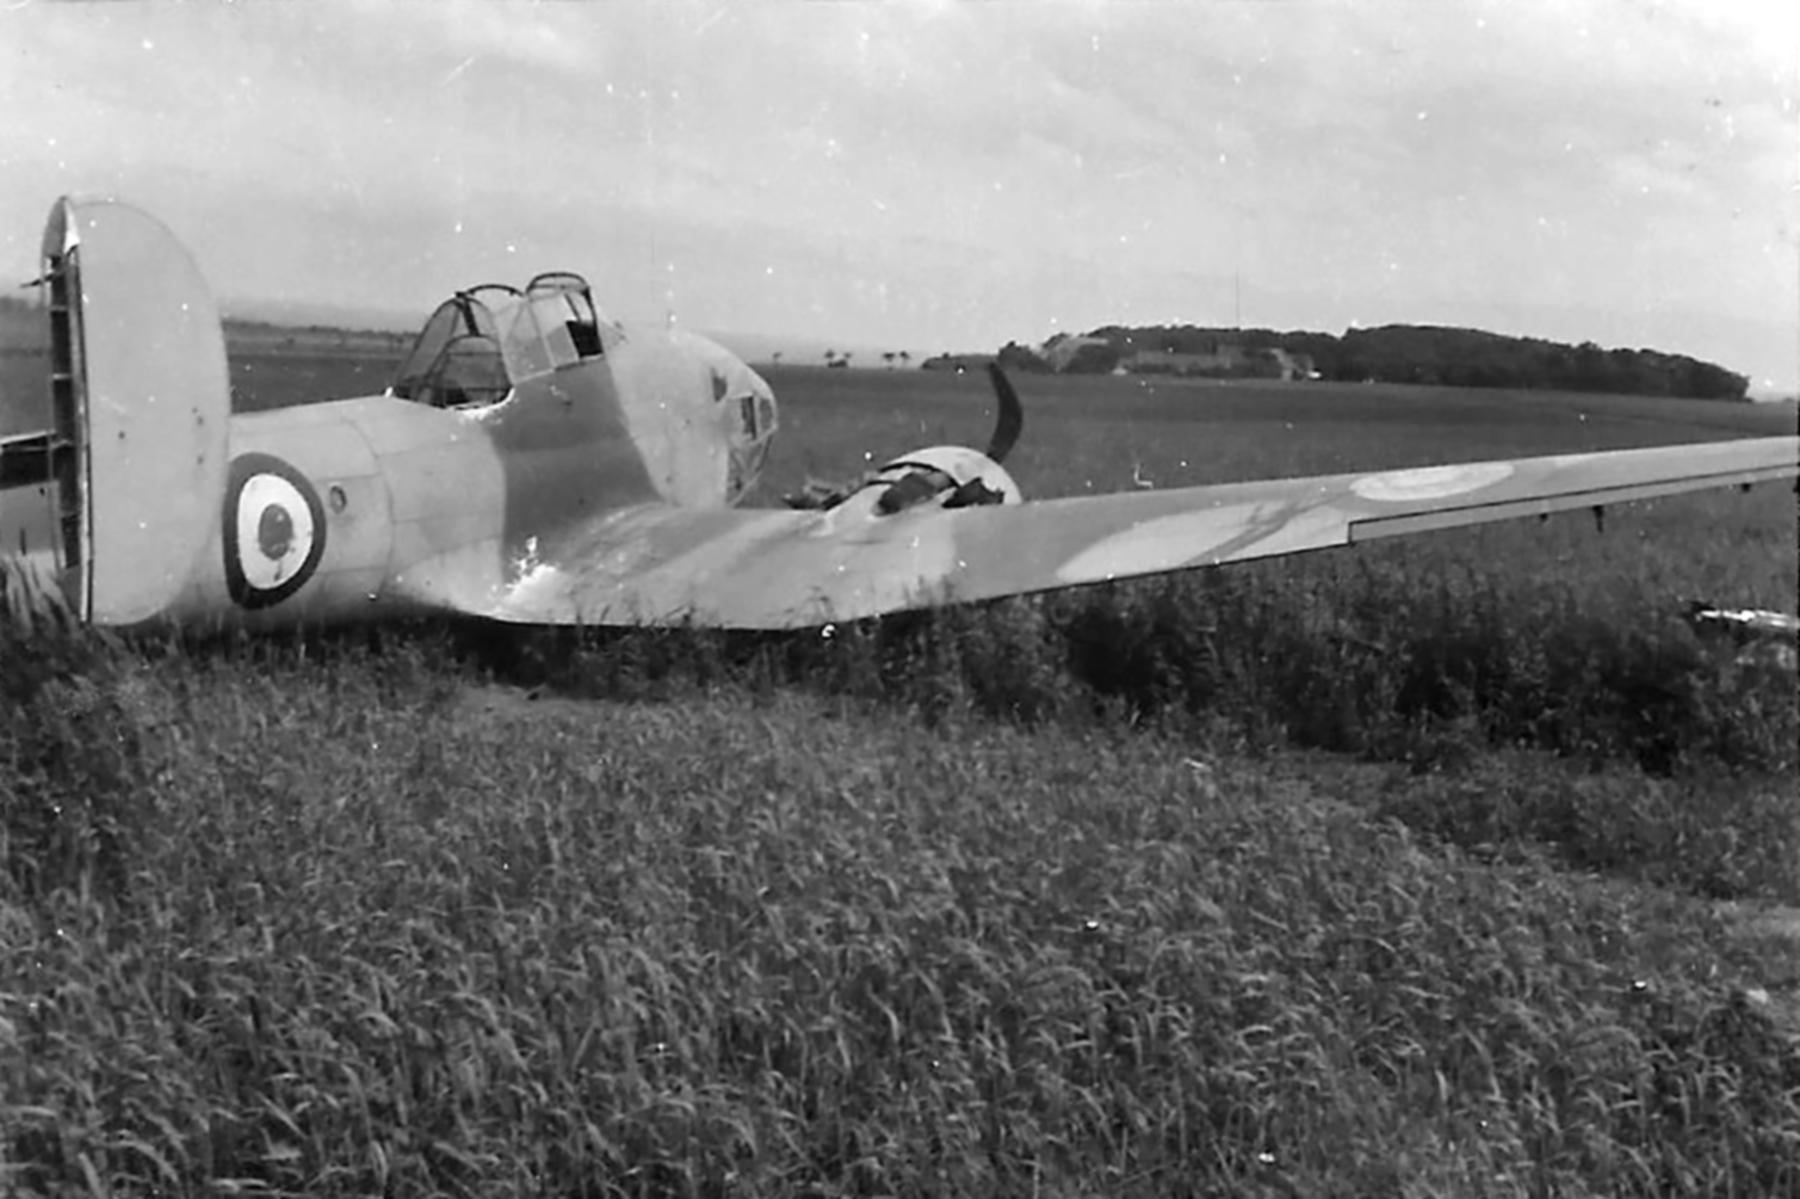 French Airforce Potez 63.11 force landed at Saint Inglevert France 1940 ebay 01